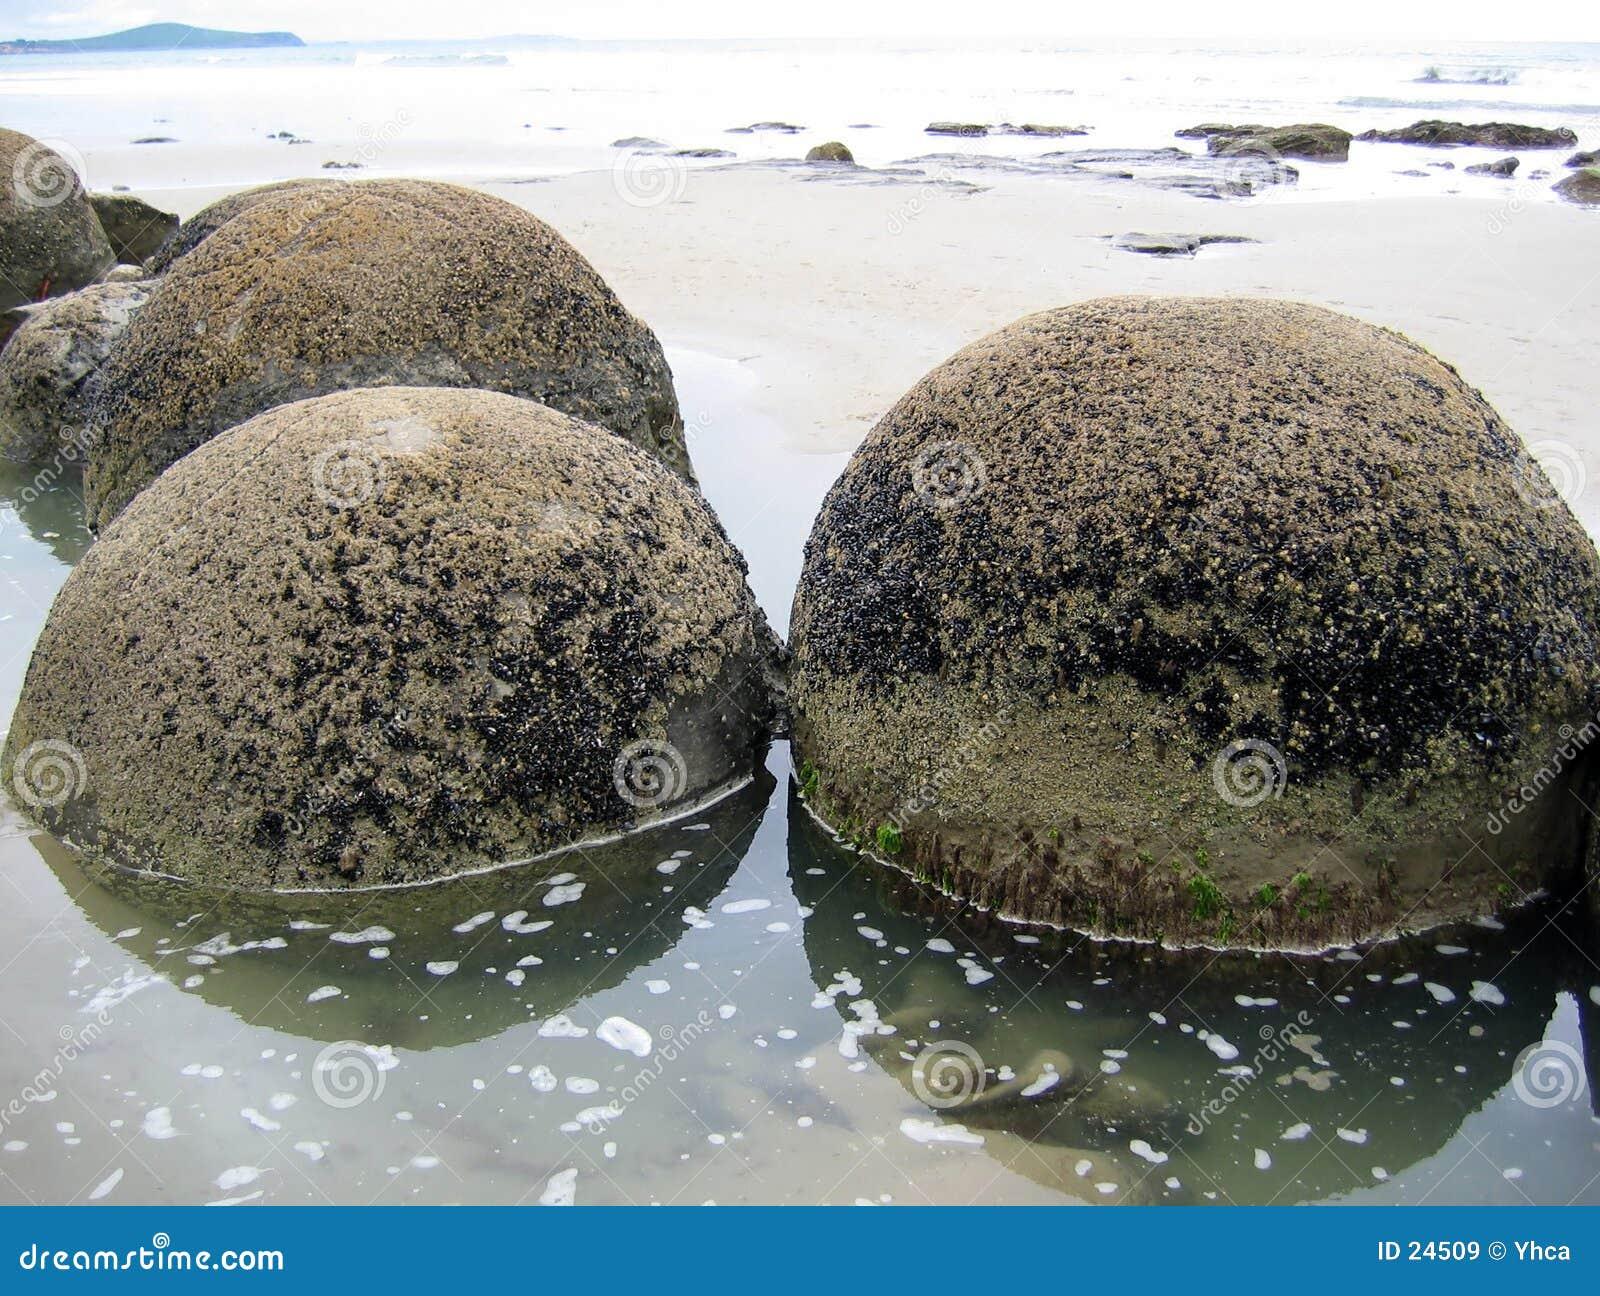 Moeraki Boulders close up